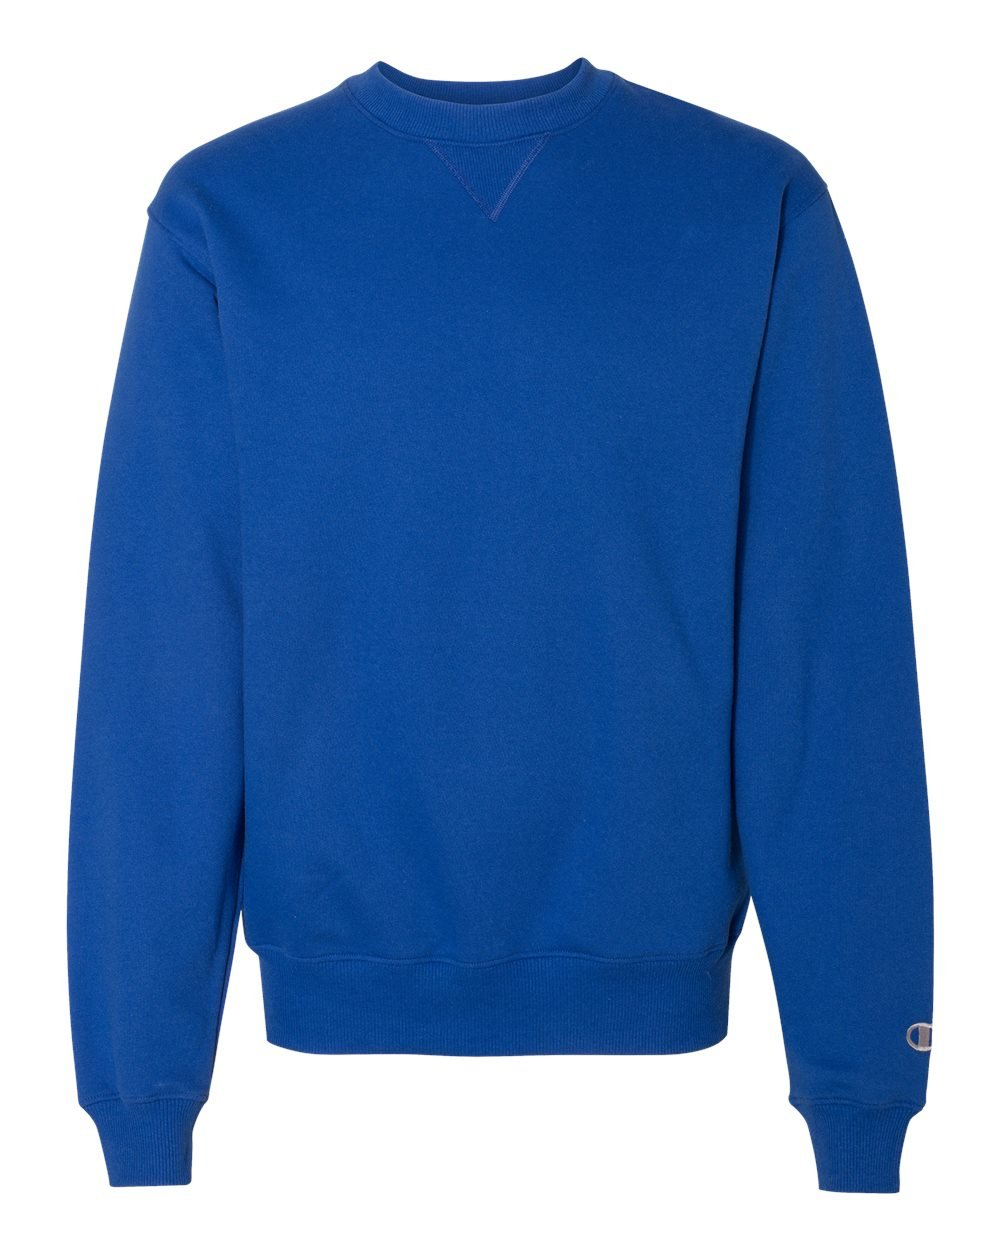 Champion Mens French Terry Crewneck navy Sweatshirt S M L XL 2XL